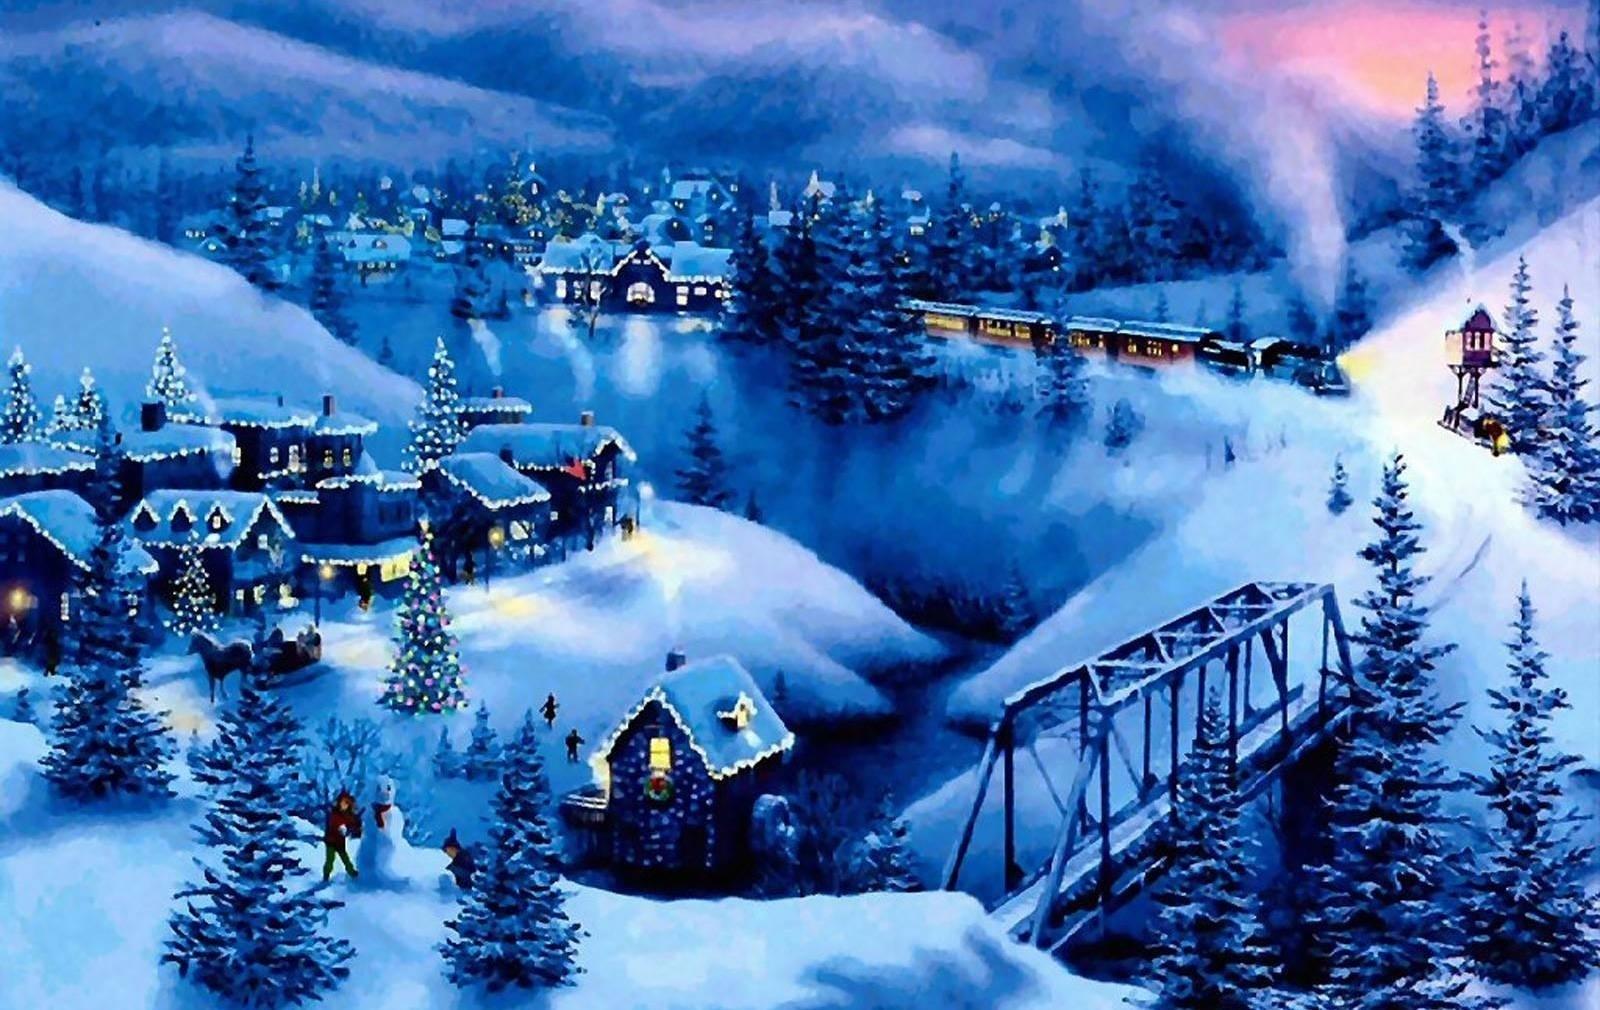 Title 3d Snow Falling Wallpaper Beautiful Wallpapers Dimension 1600 X 1010 File Type JPG JPEG